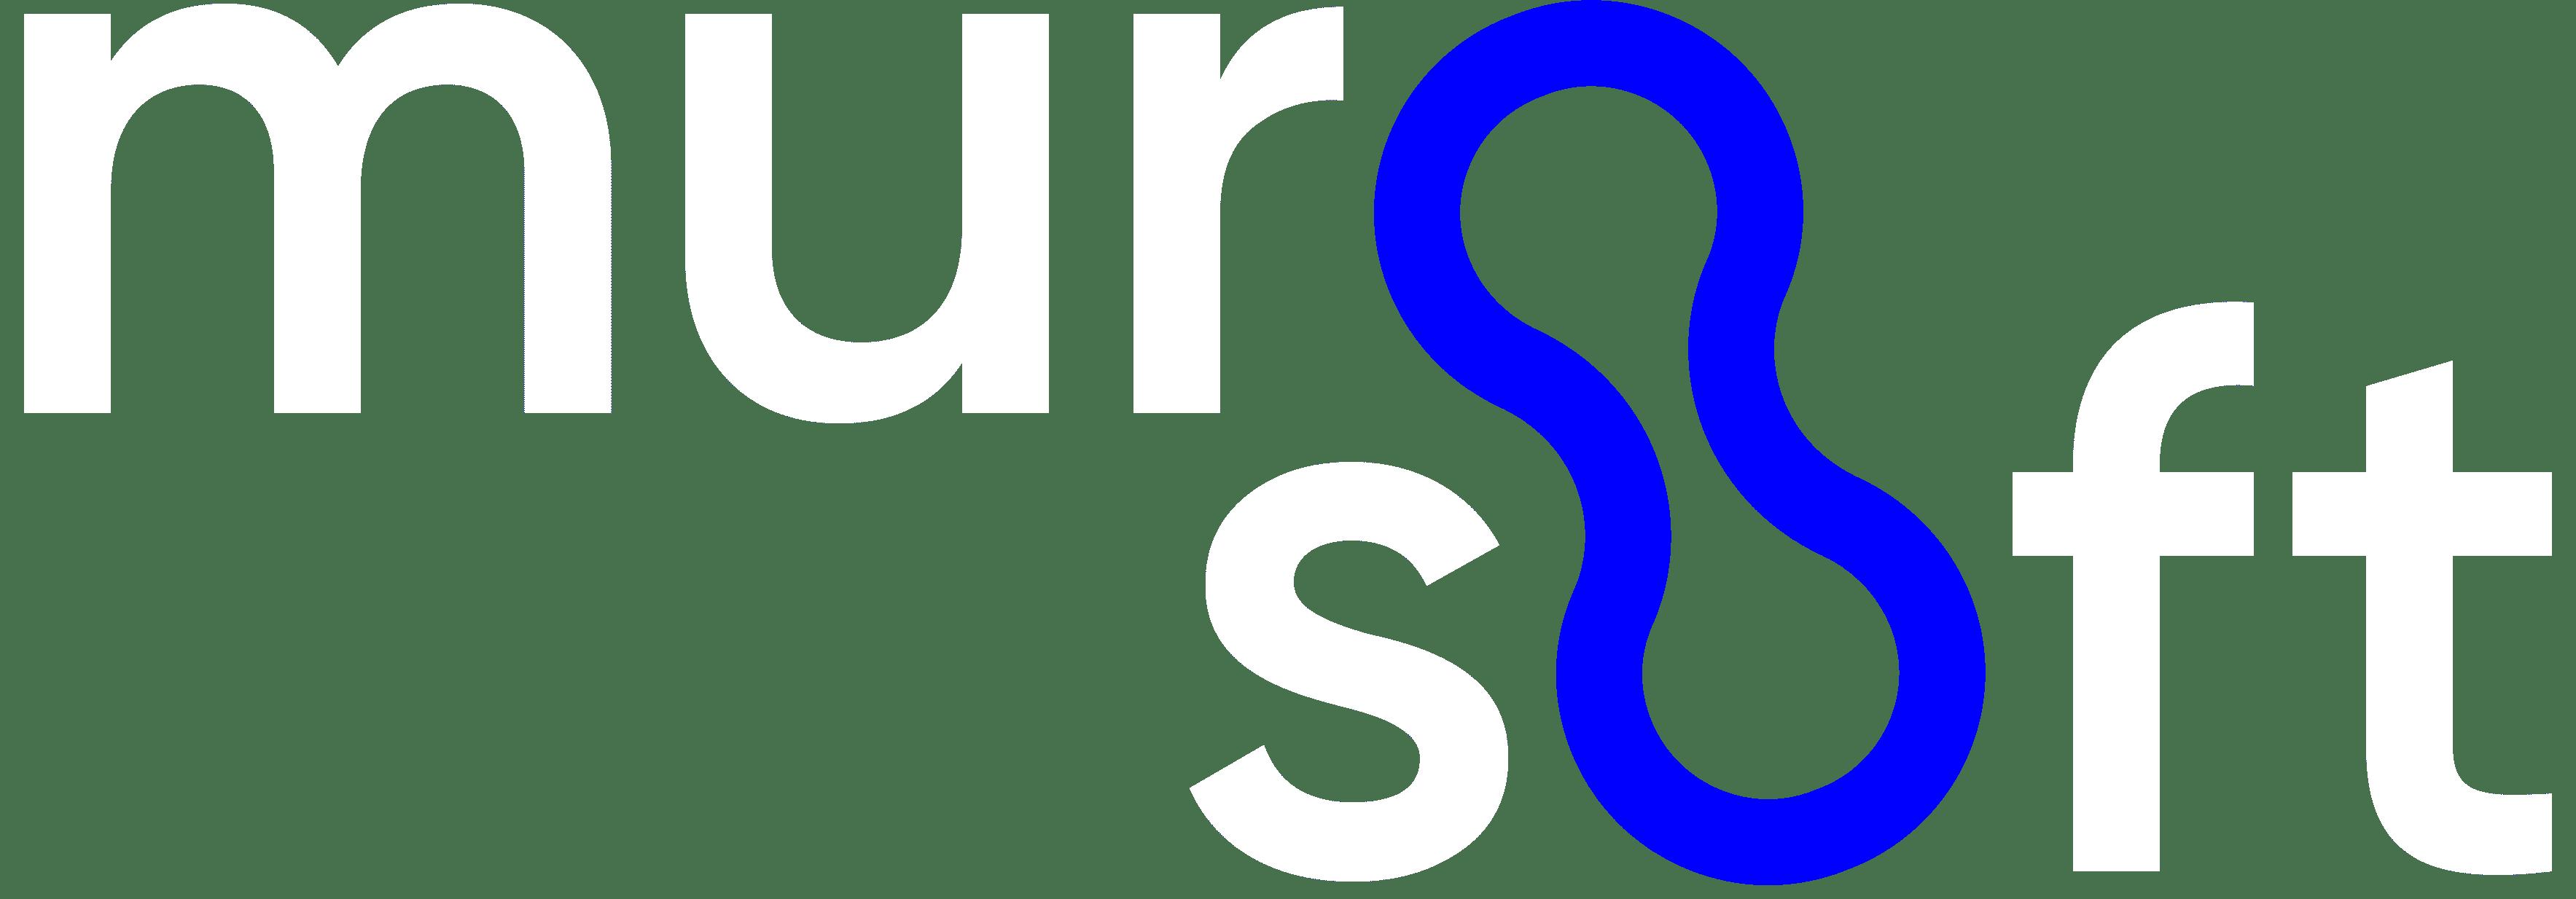 Logotipo Murosoft